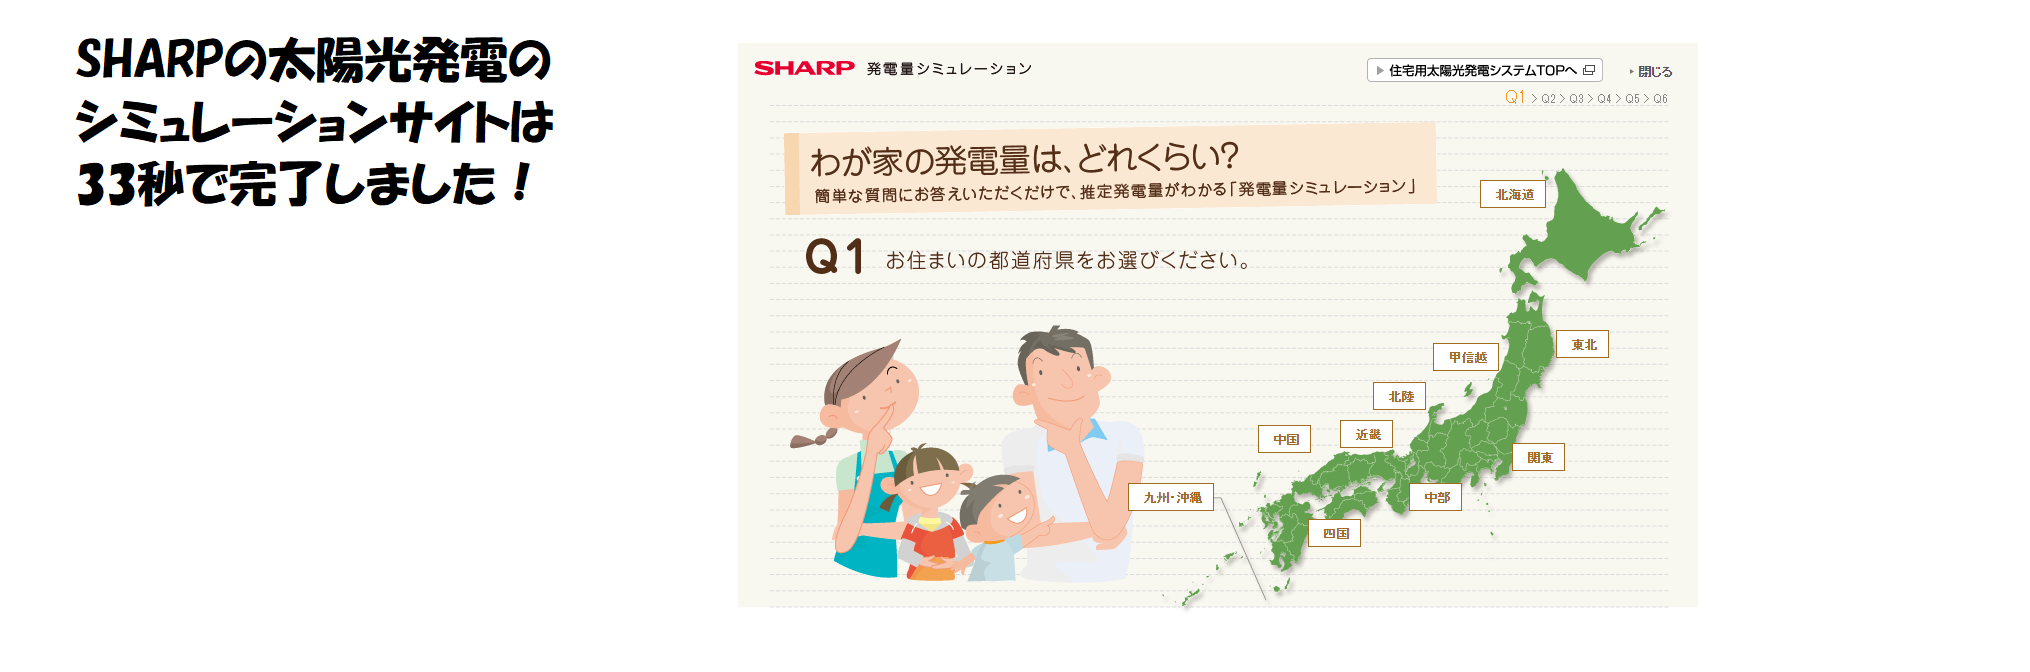 SHARPのシミュレーションサイト